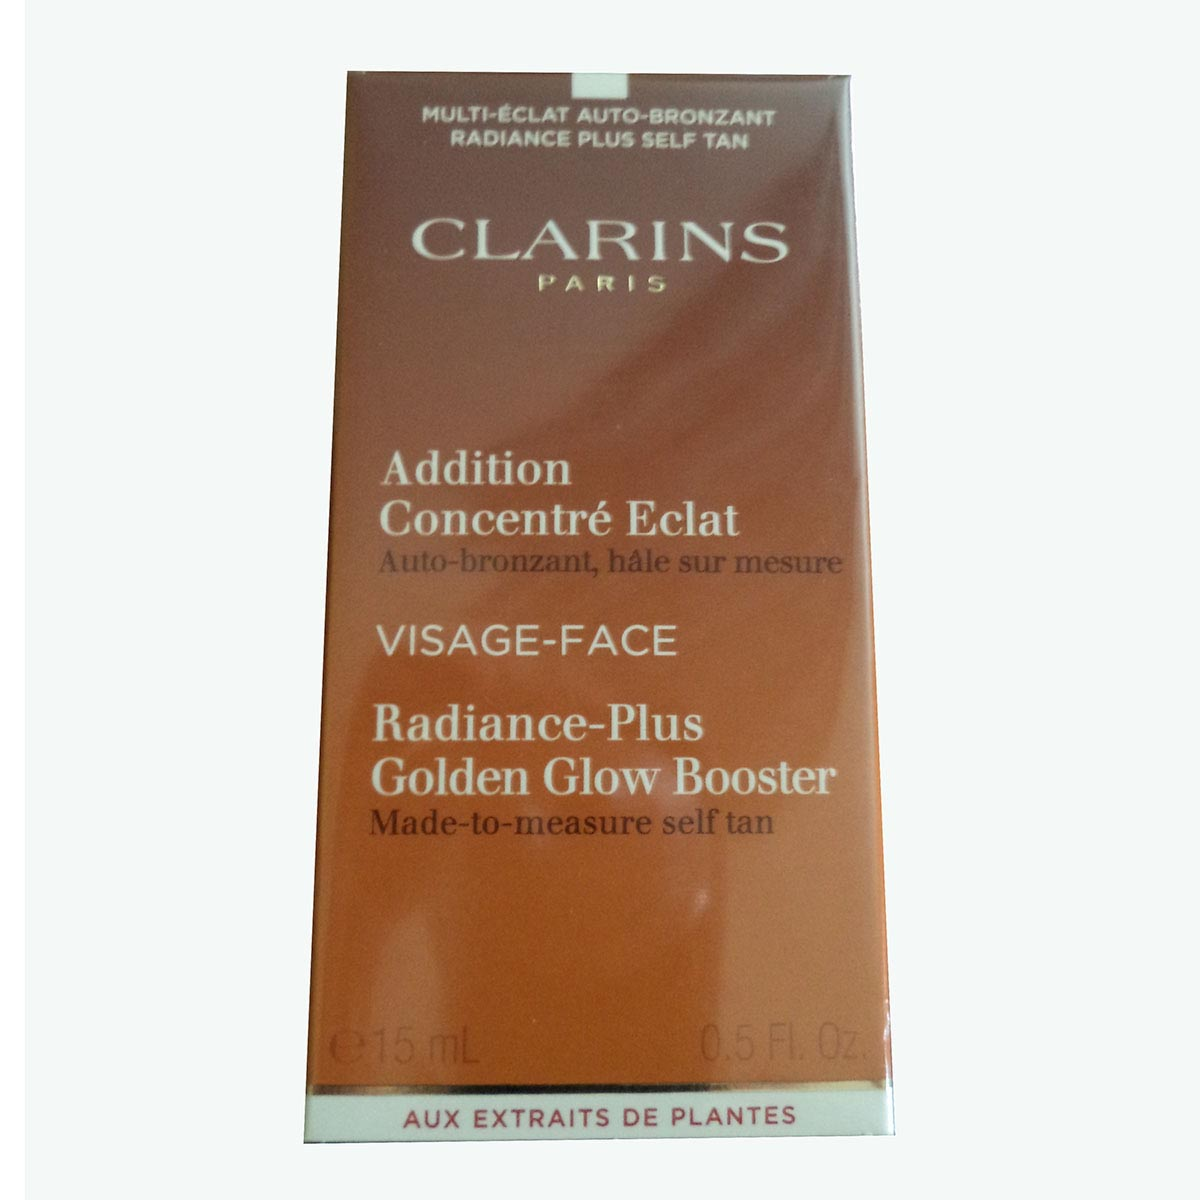 Clarins addition concentr eclat visage cream 15ml